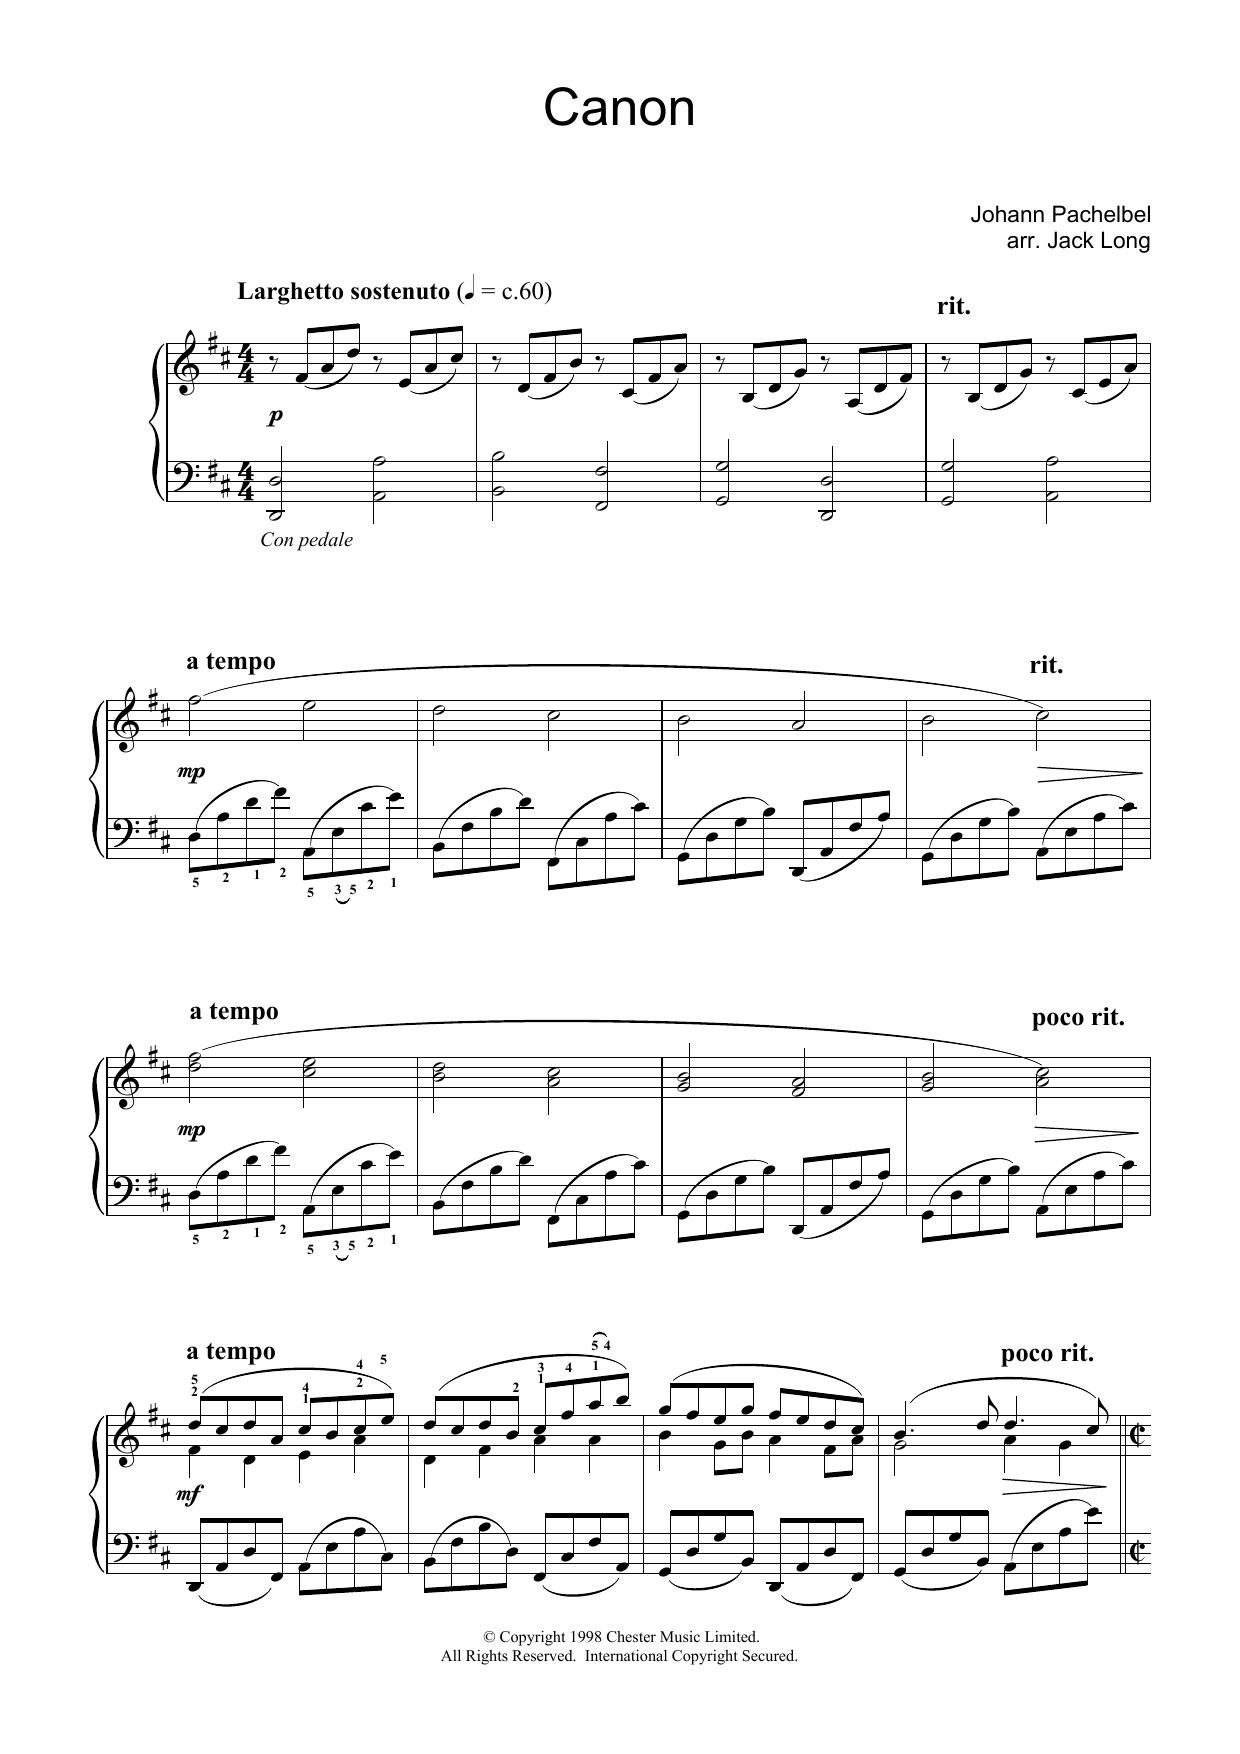 Gallery Of Banjo Banjo Chords For Wagon Wheel Sheet Music Digital